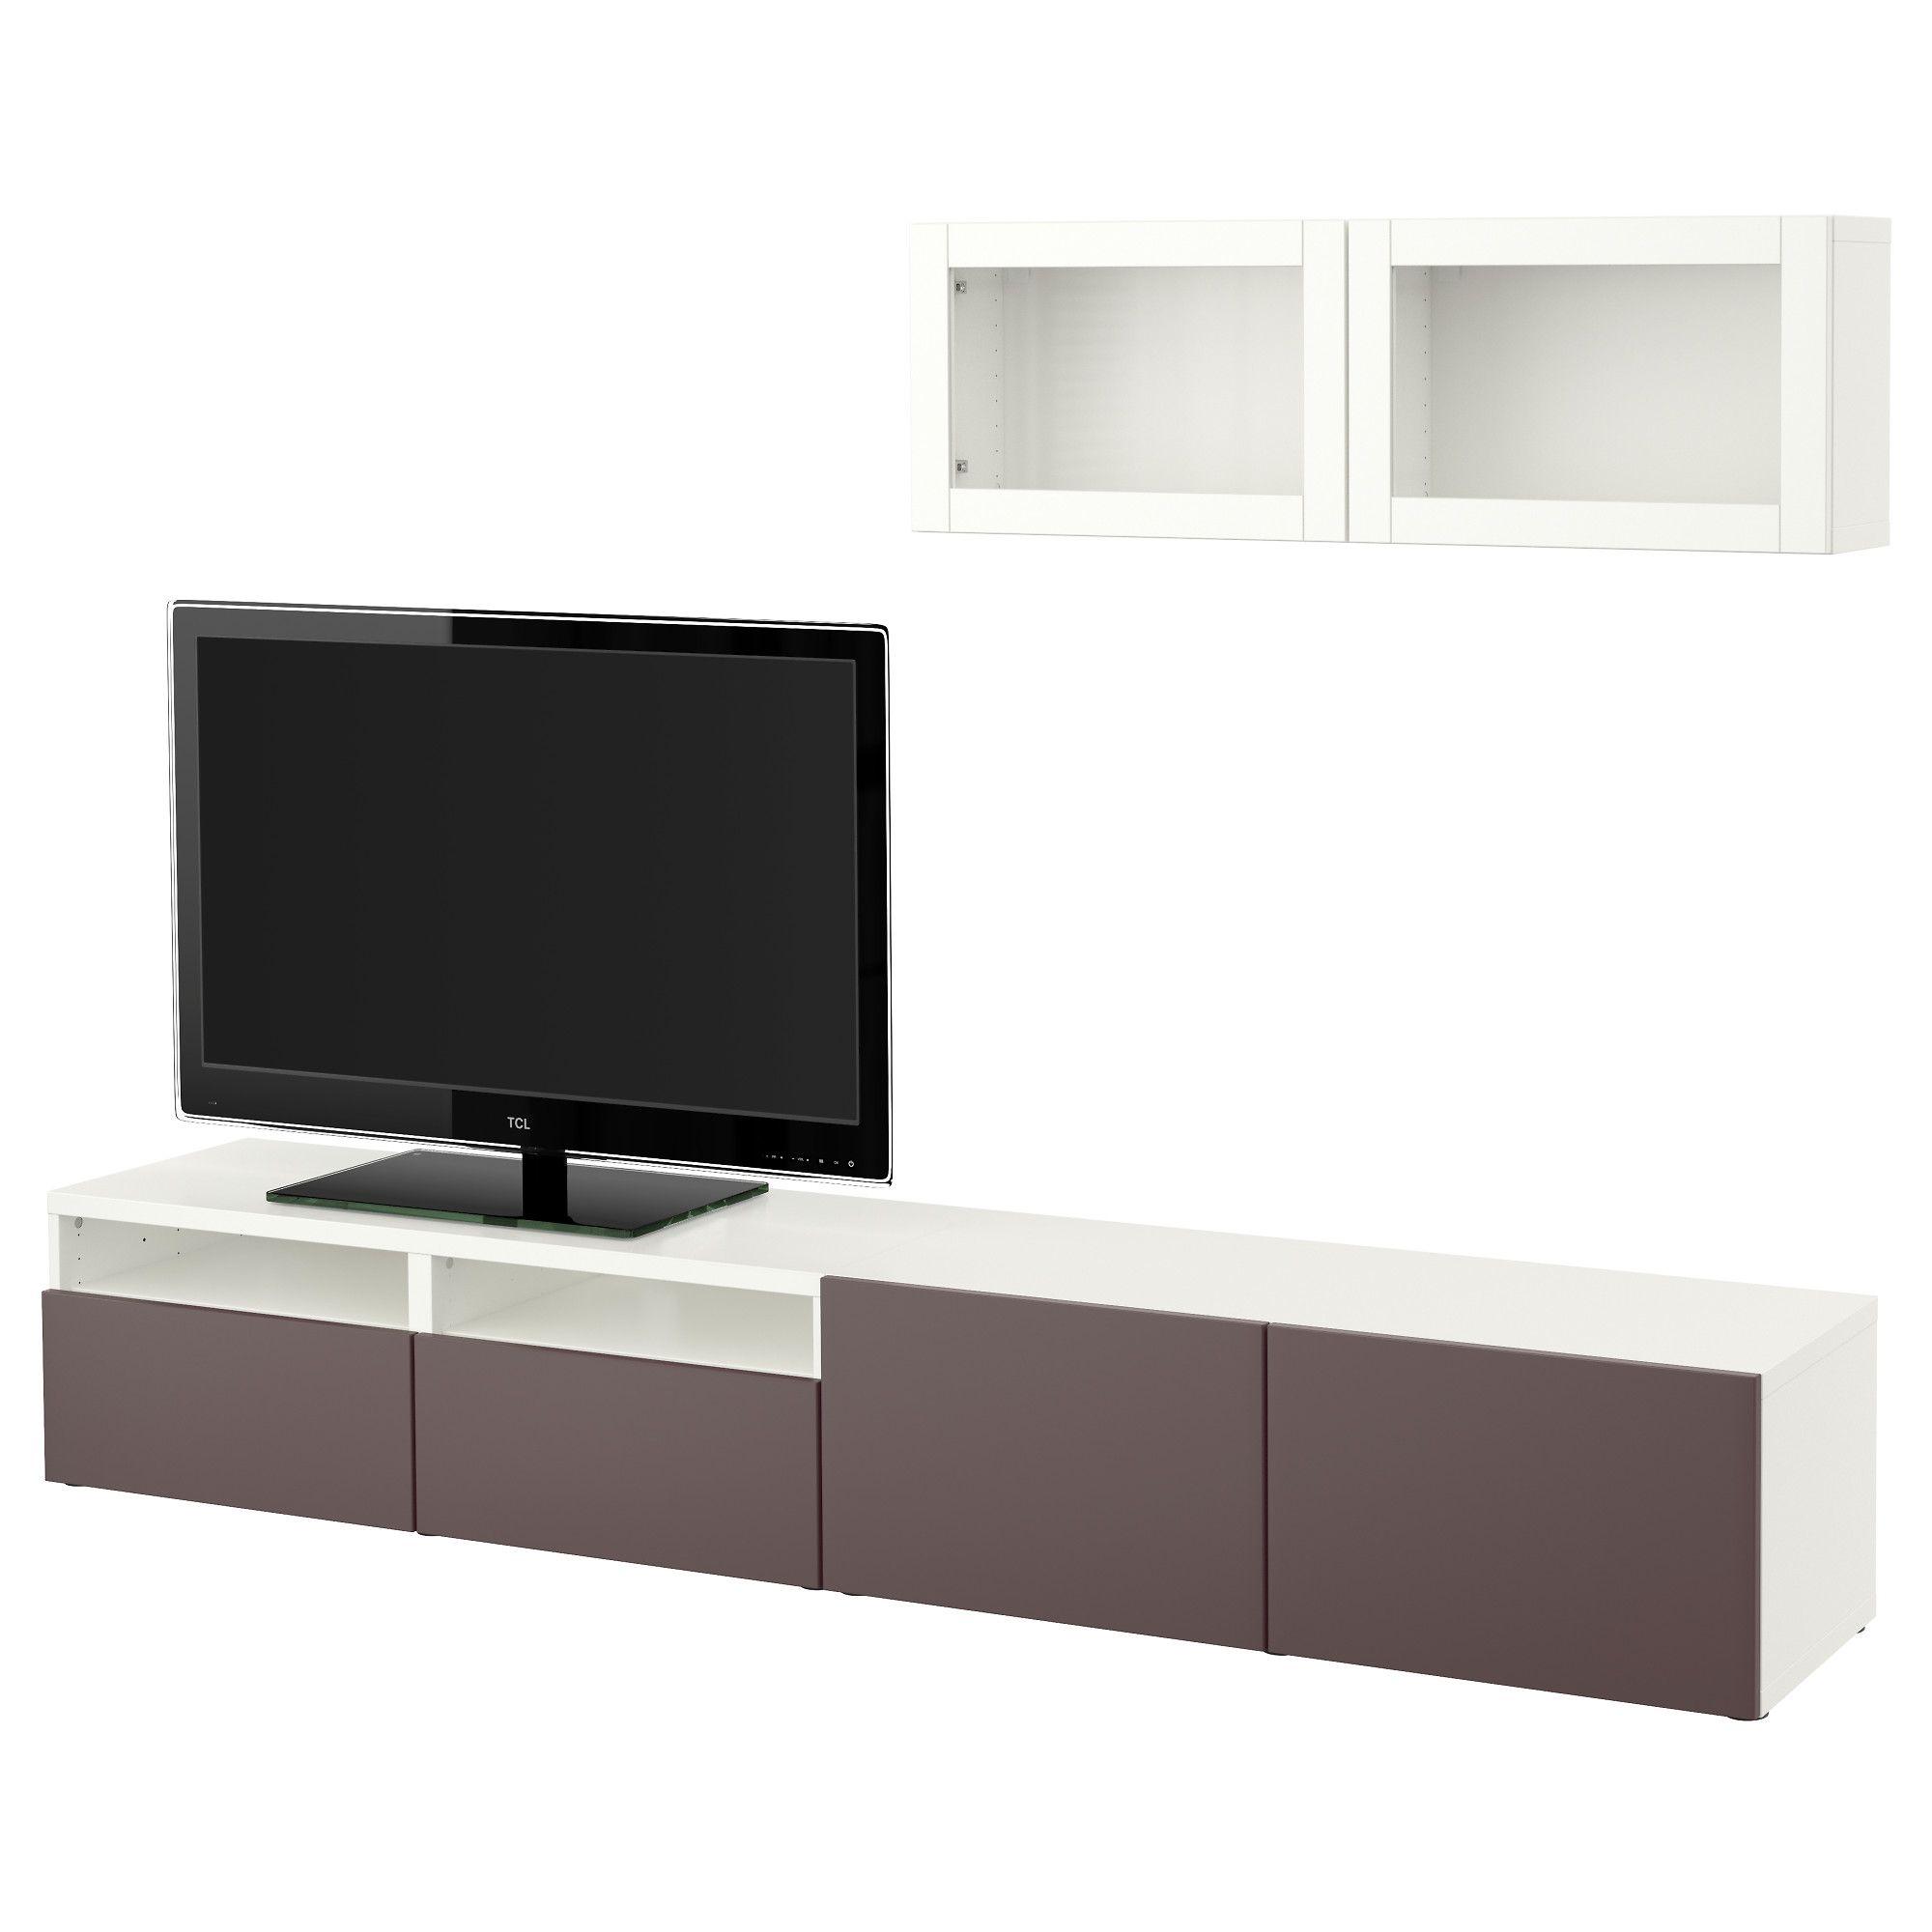 Ikea Besta Tv Storage Combination Glass Doors White Valviken Dark Tv Cabinet Ikea Basement Living Rooms Ikea